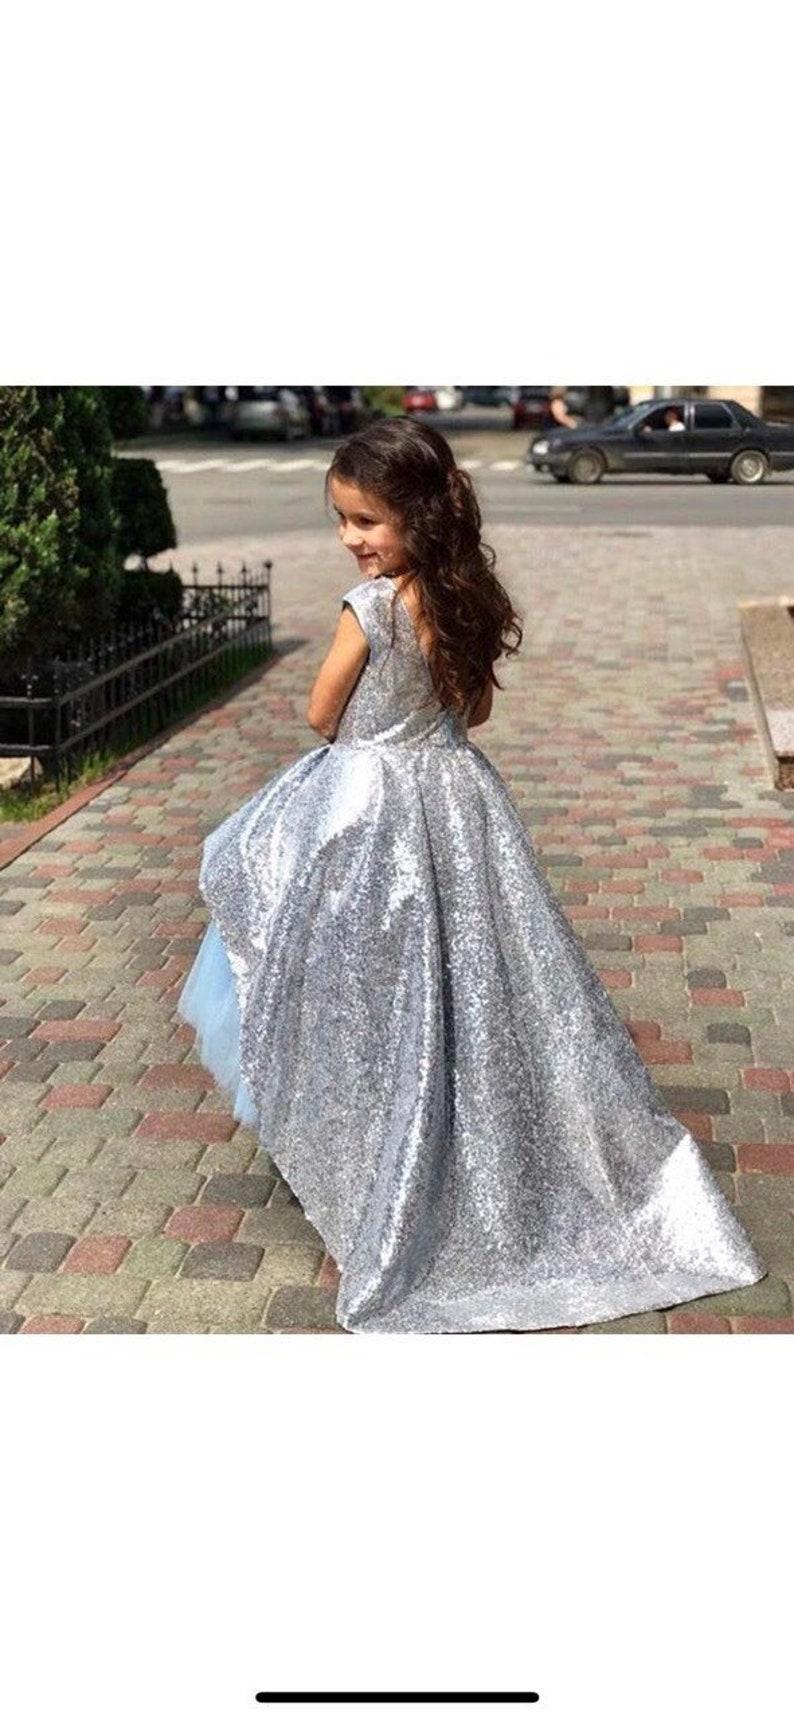 silver sequin dress silver flower girl sequin party dress sparkly dress silver sequin dress grey girl dress sequin fabric opened back dress